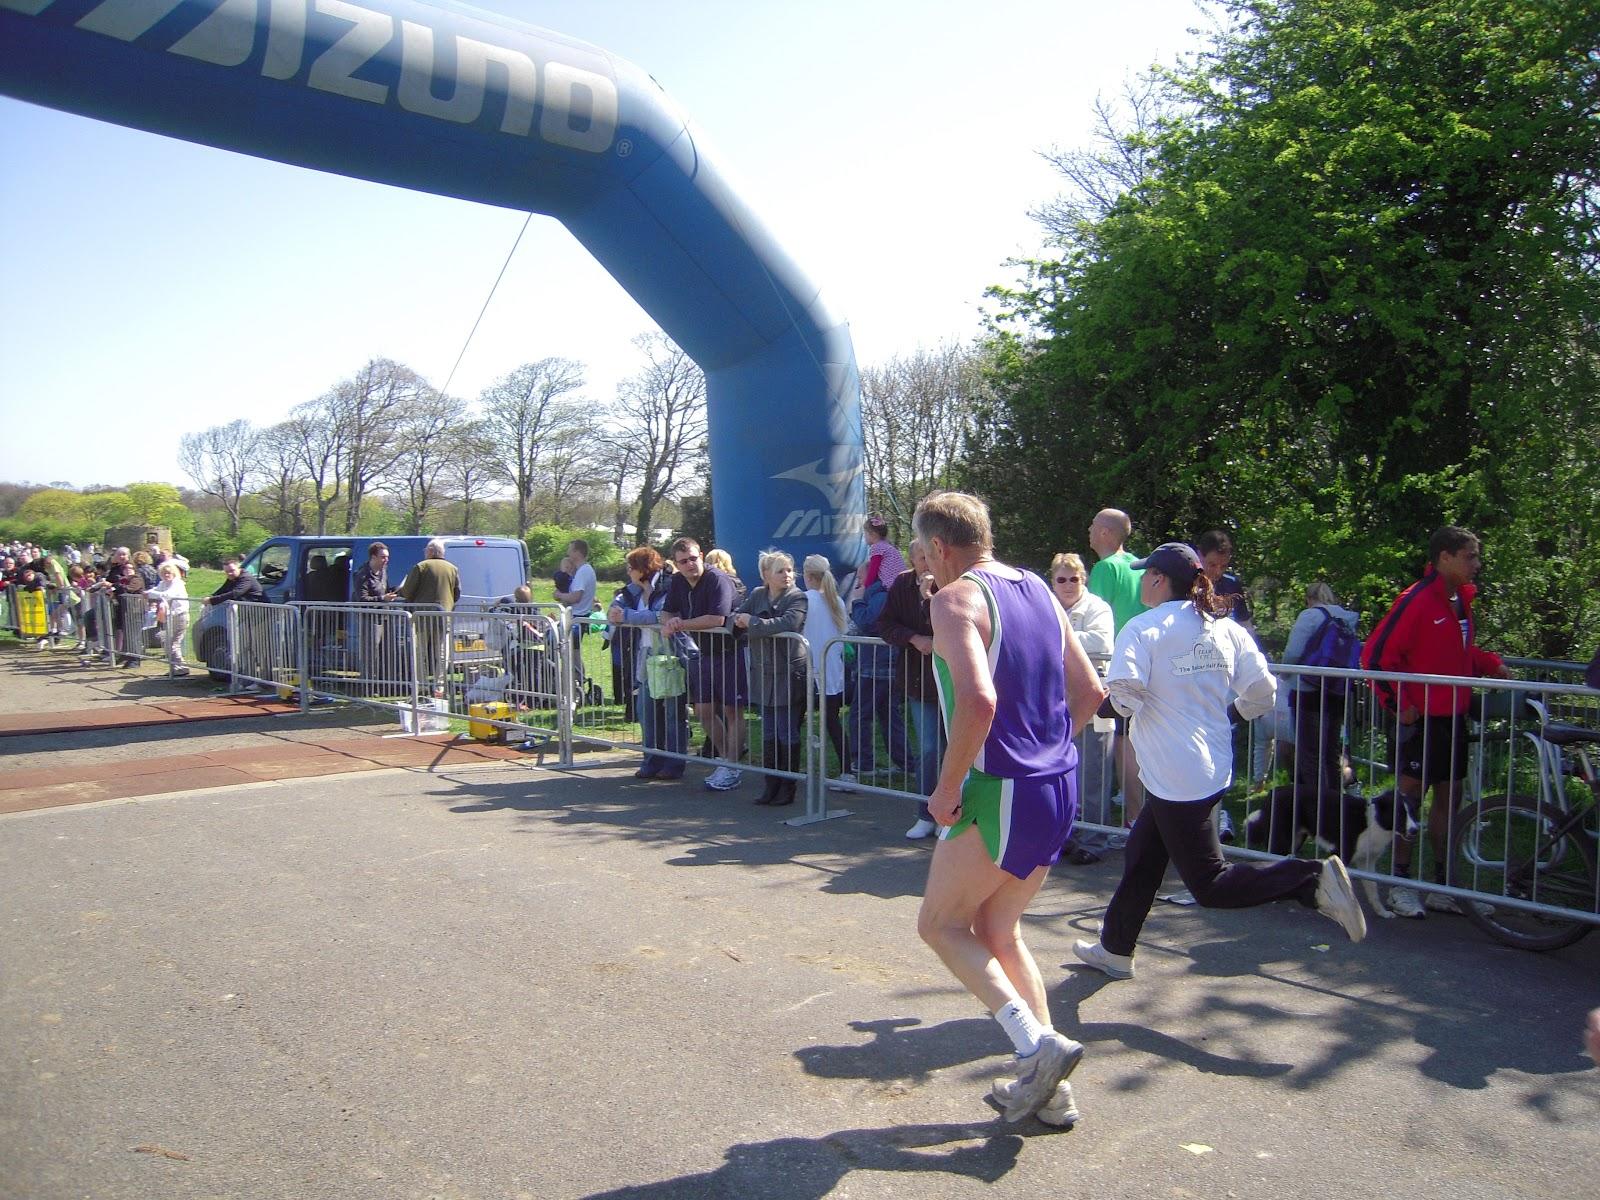 Redcar Half Marathon 2009 - 2009-04-19--11.51.45 (31).jpg